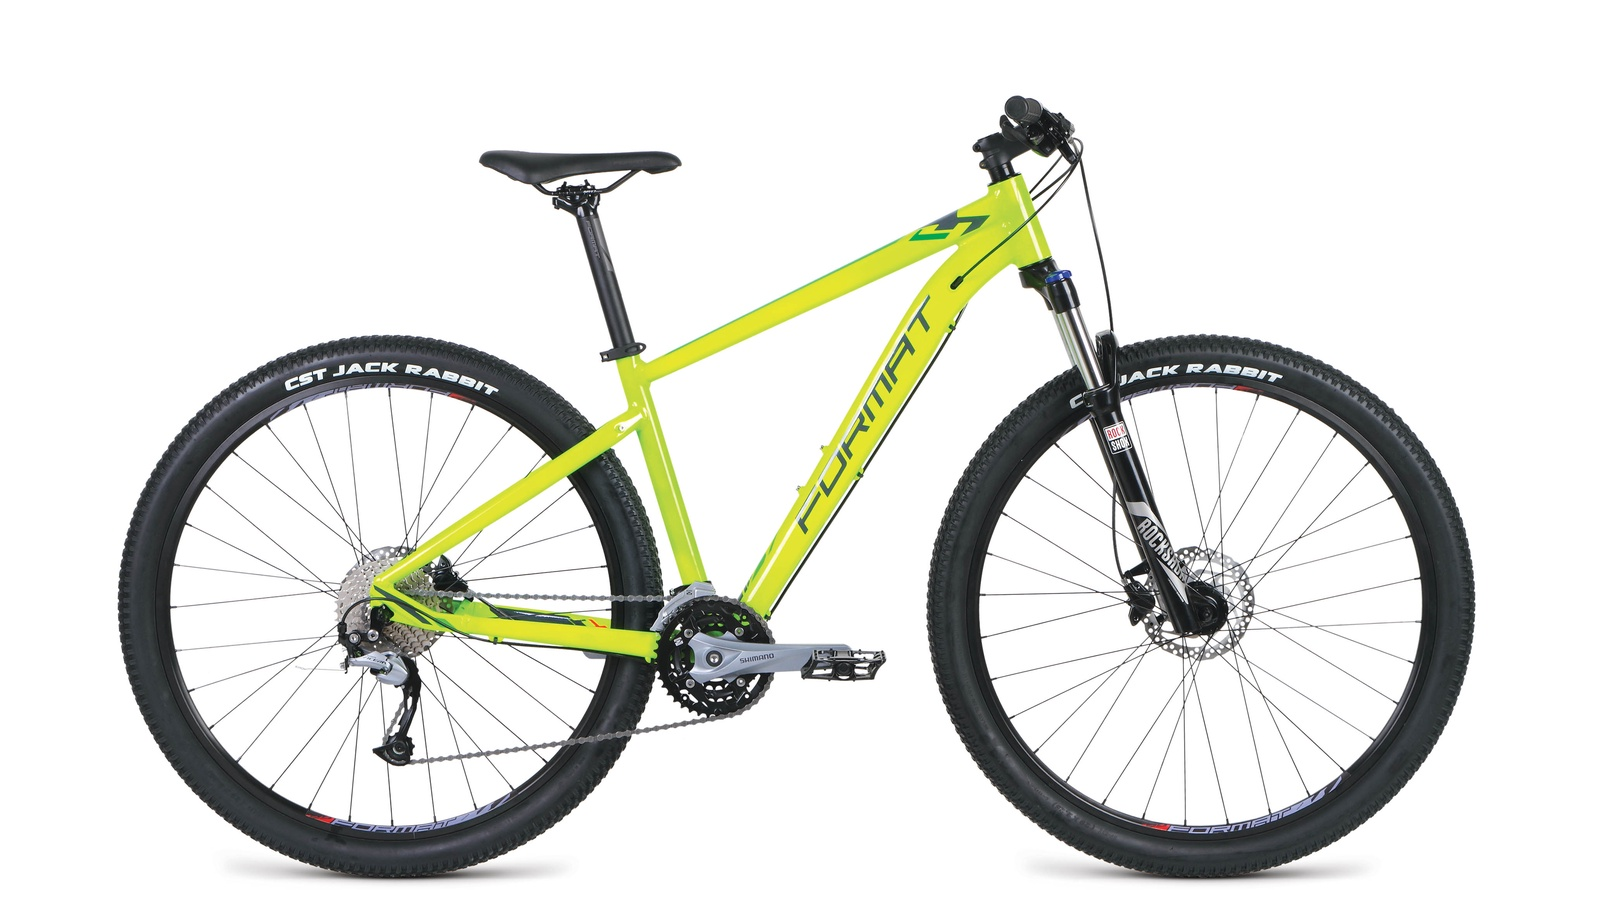 цена на Велосипед Format RBKM9M69S005, желтый